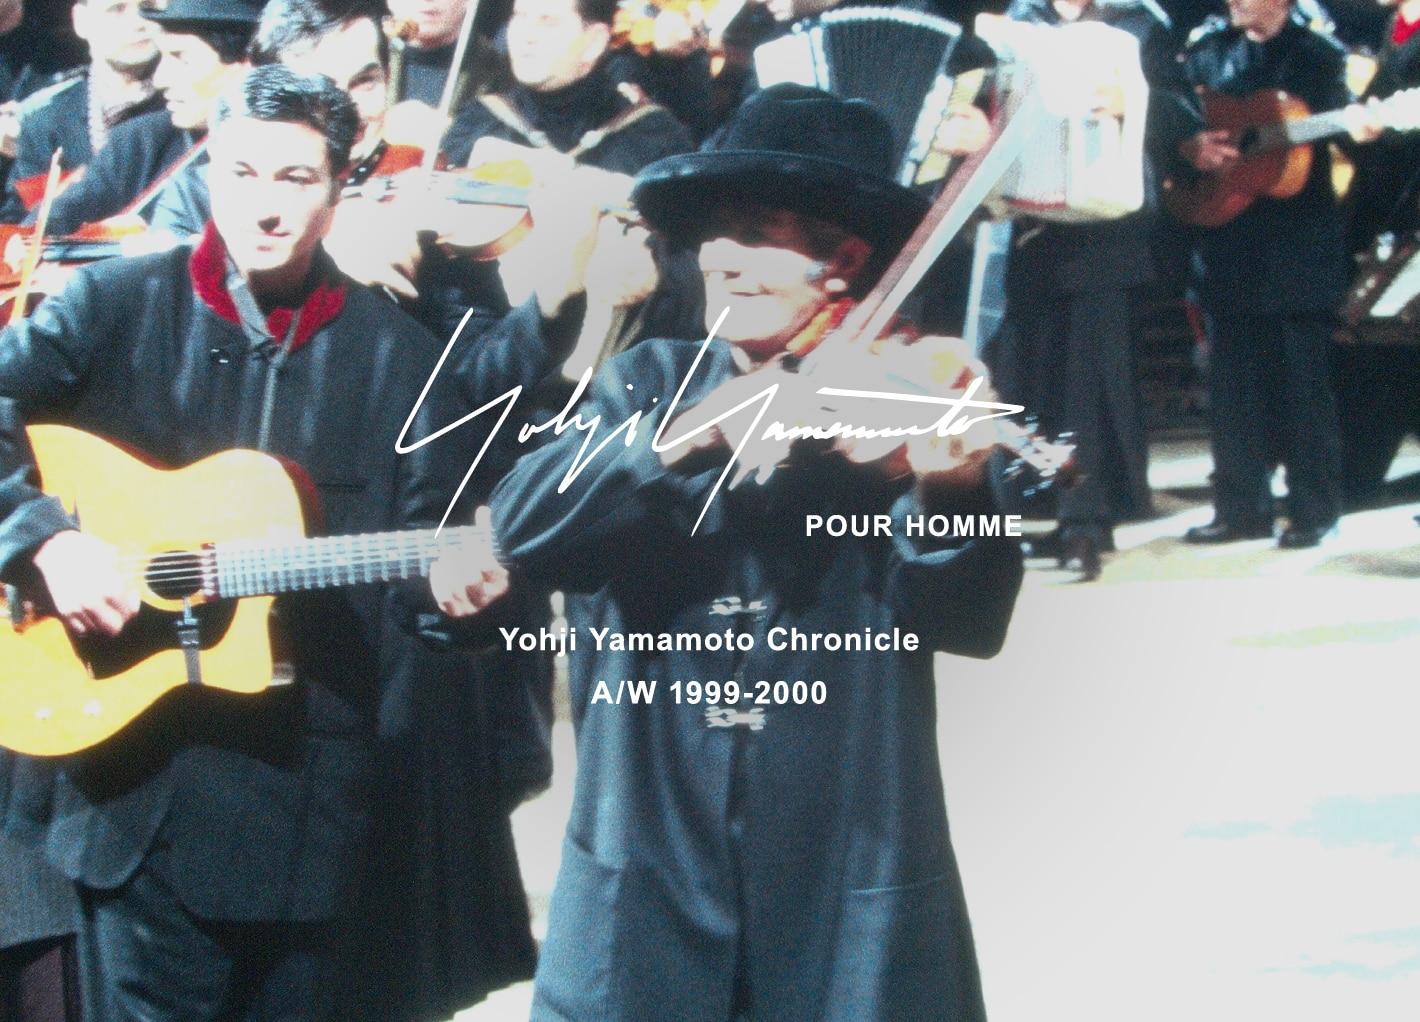 Yohji Yamamoto Chronicle – POUR HOMME AW 1999-2000